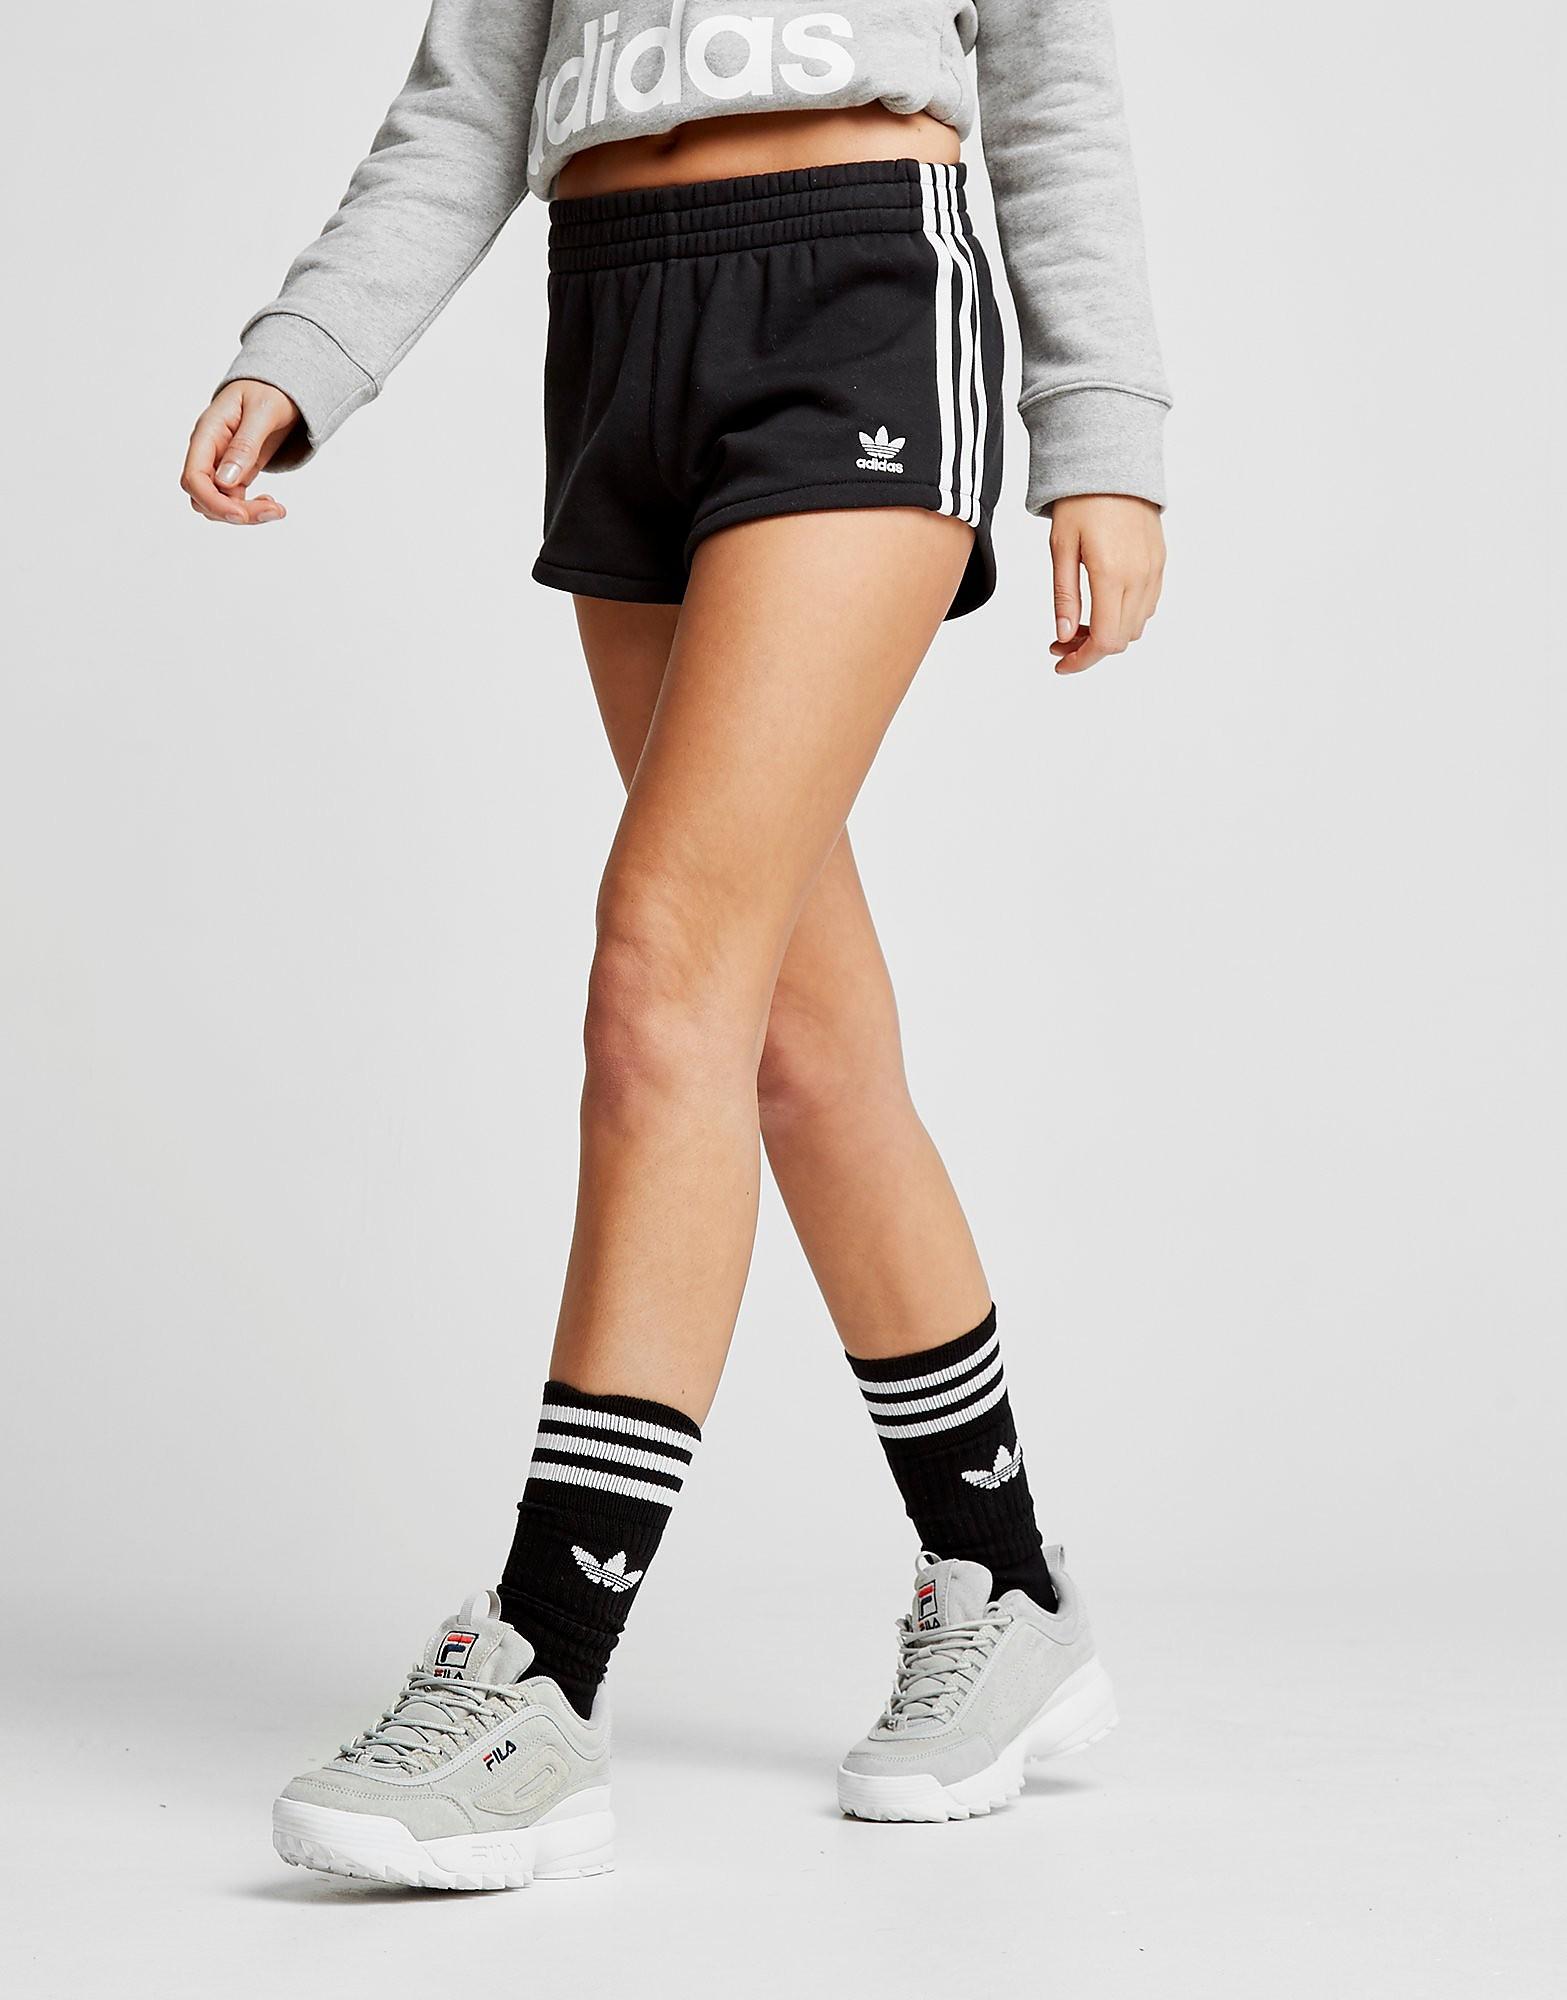 adidas Originals shorts 3-Stripe Terry